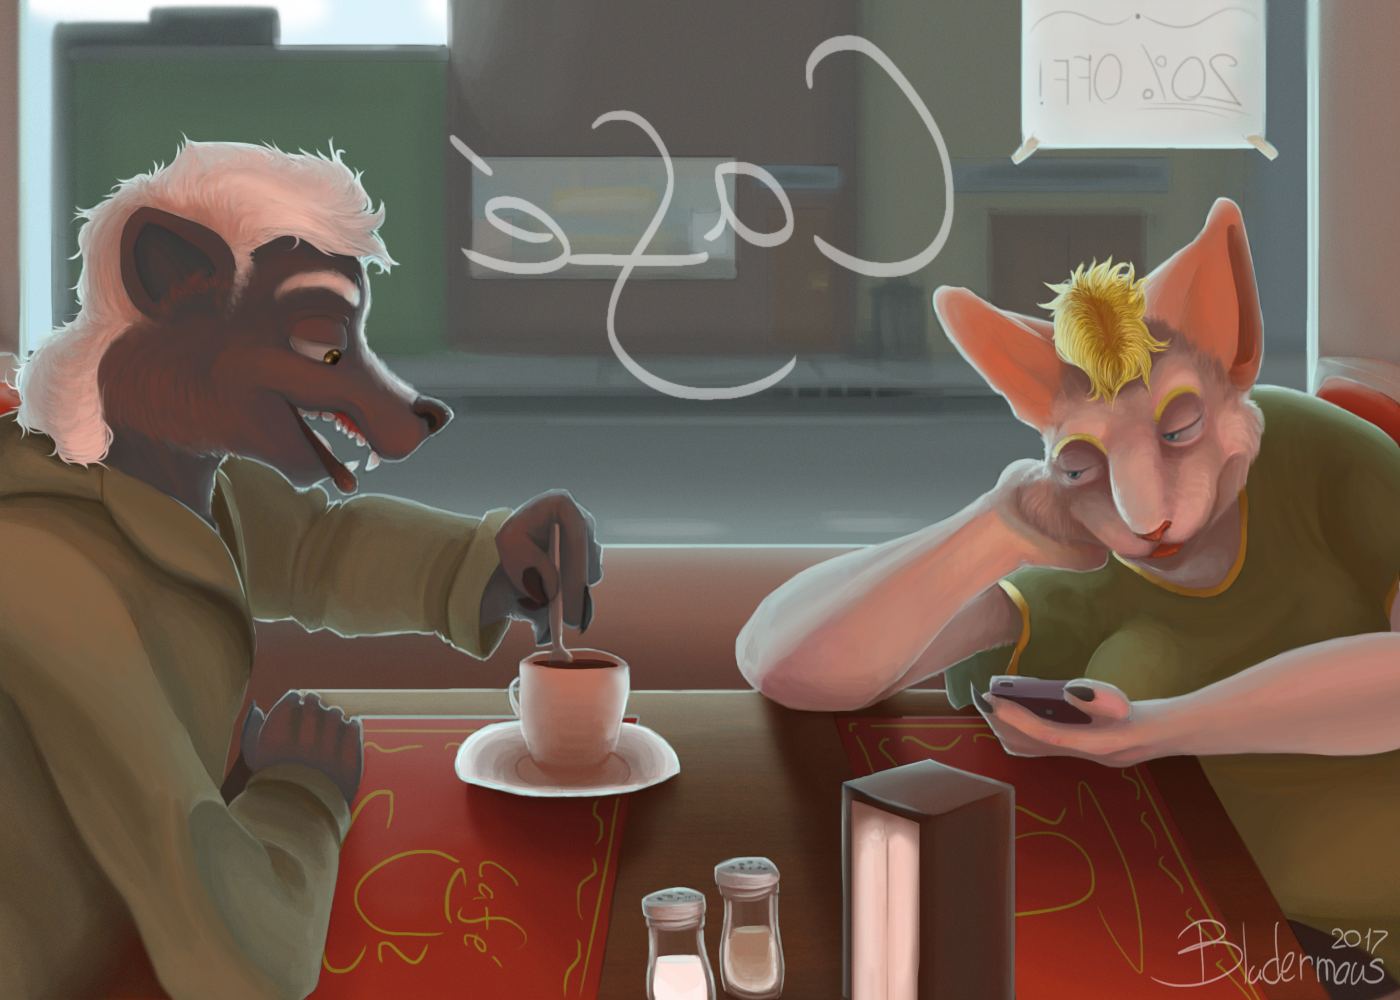 Typical Diner Scene